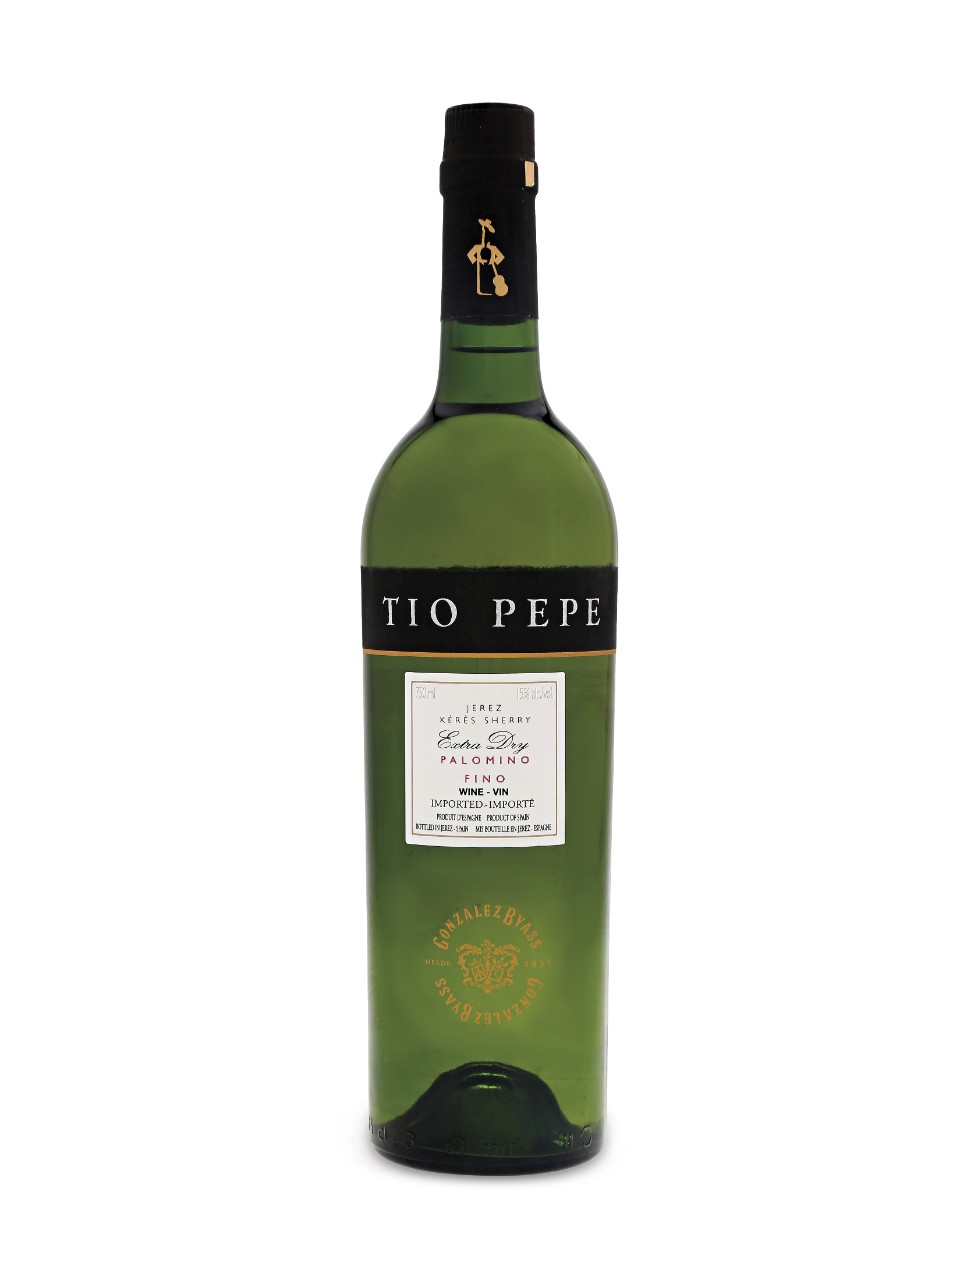 Tio Pepe Extra Dry Fino Lcbo